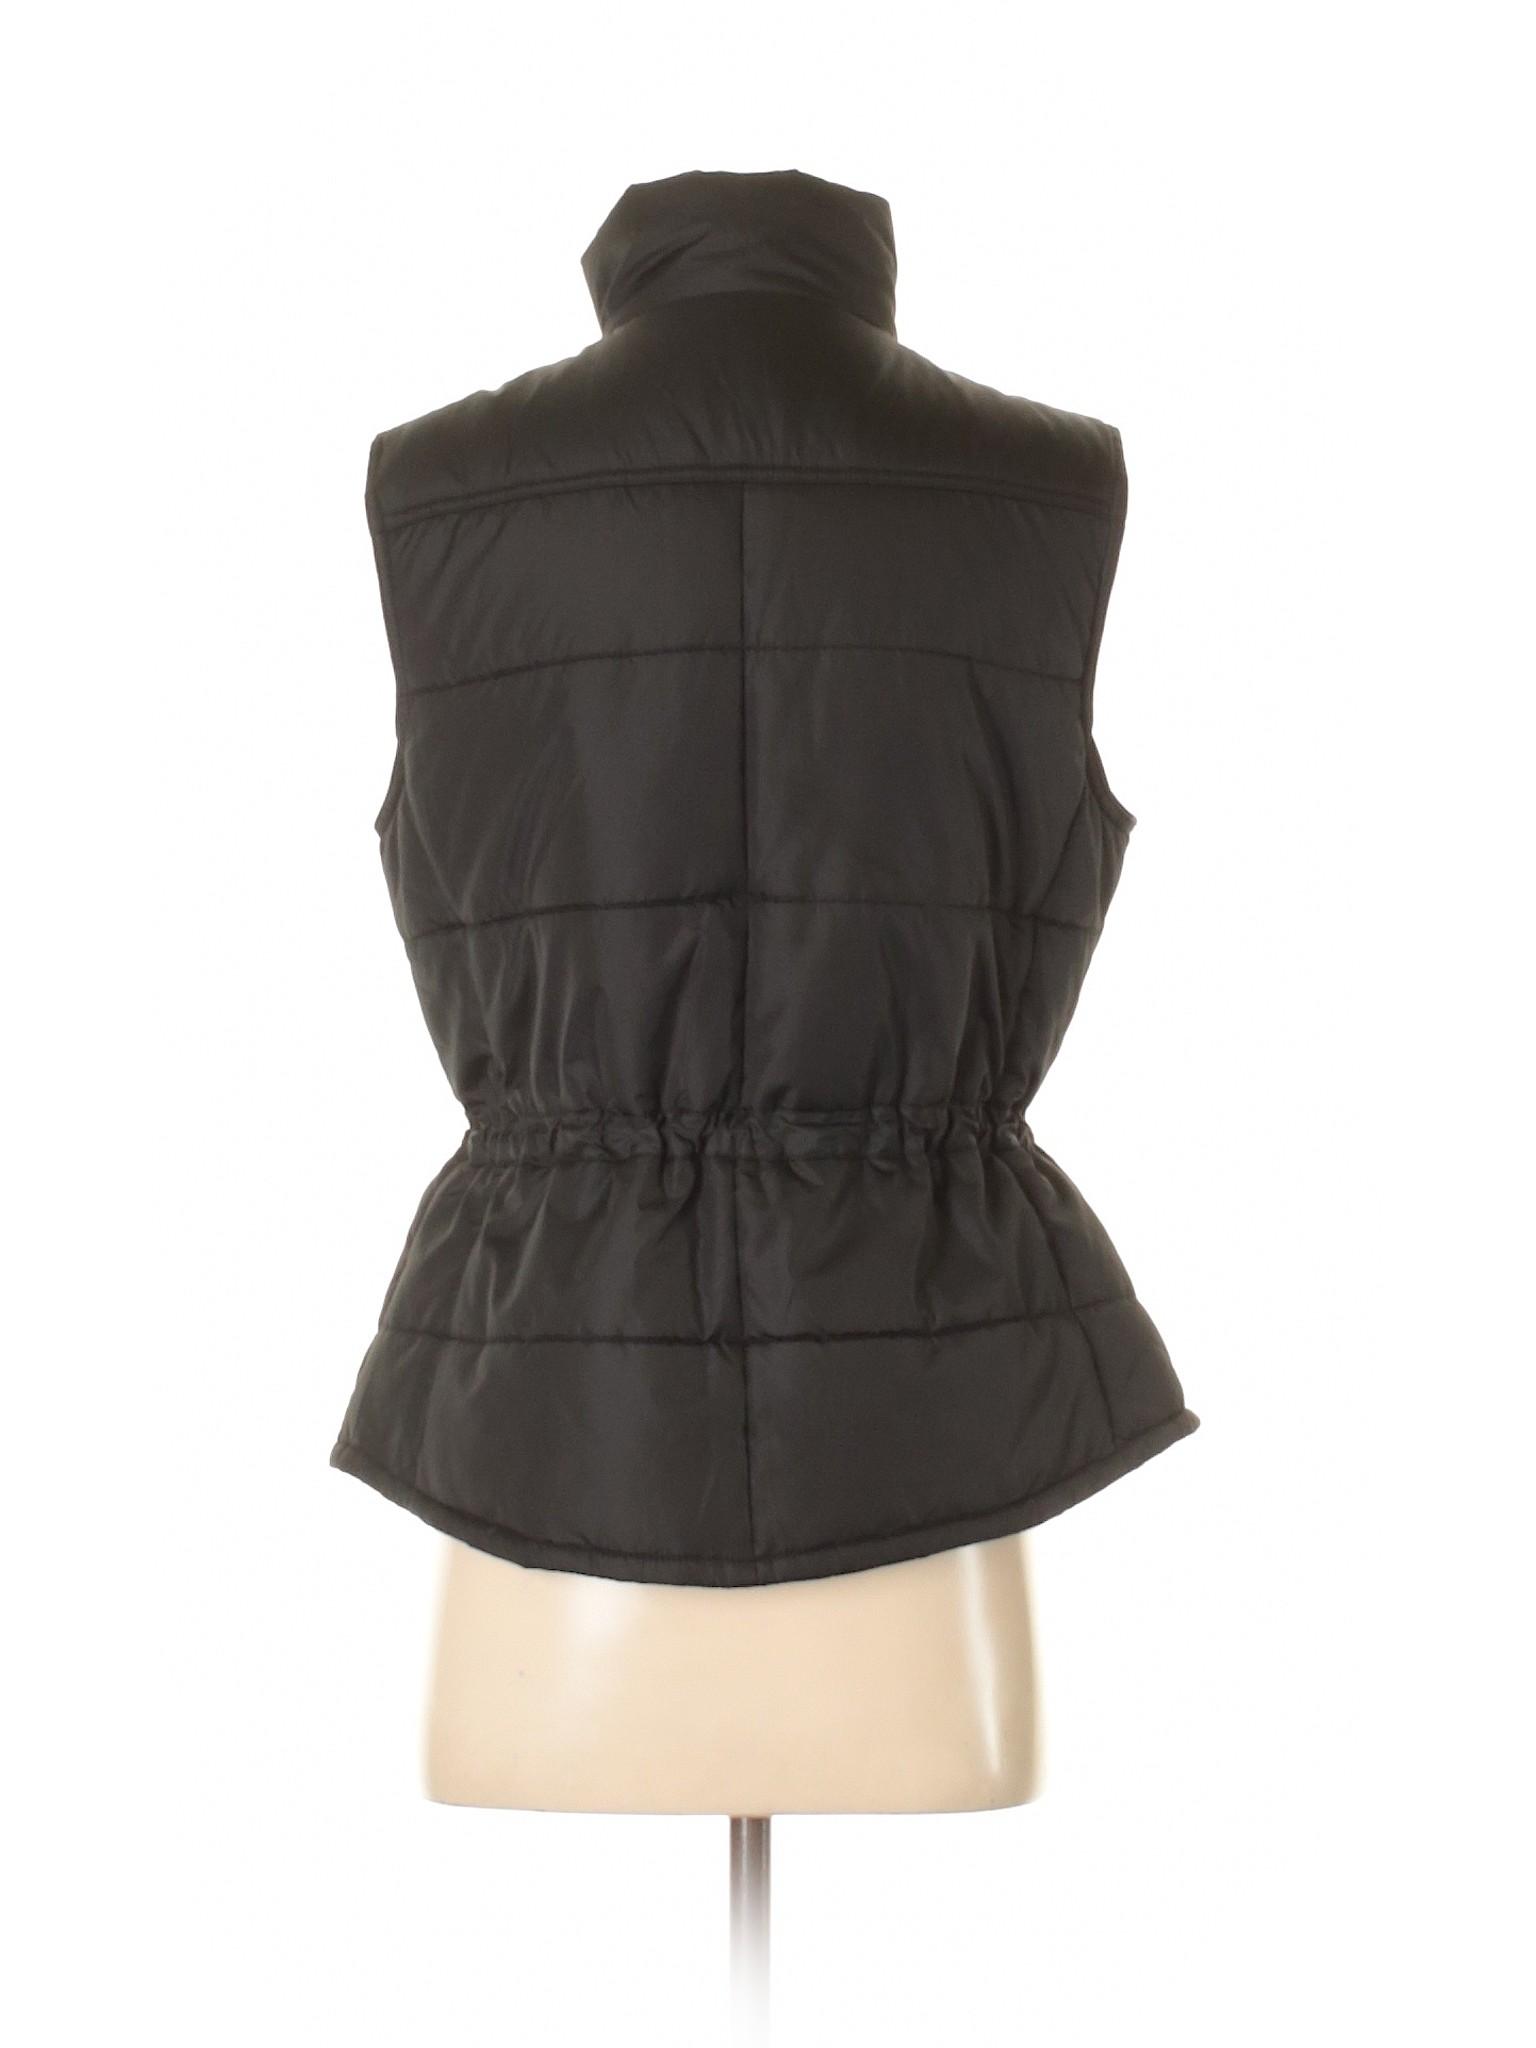 Boutique New Company York Vest amp; HHqrw0